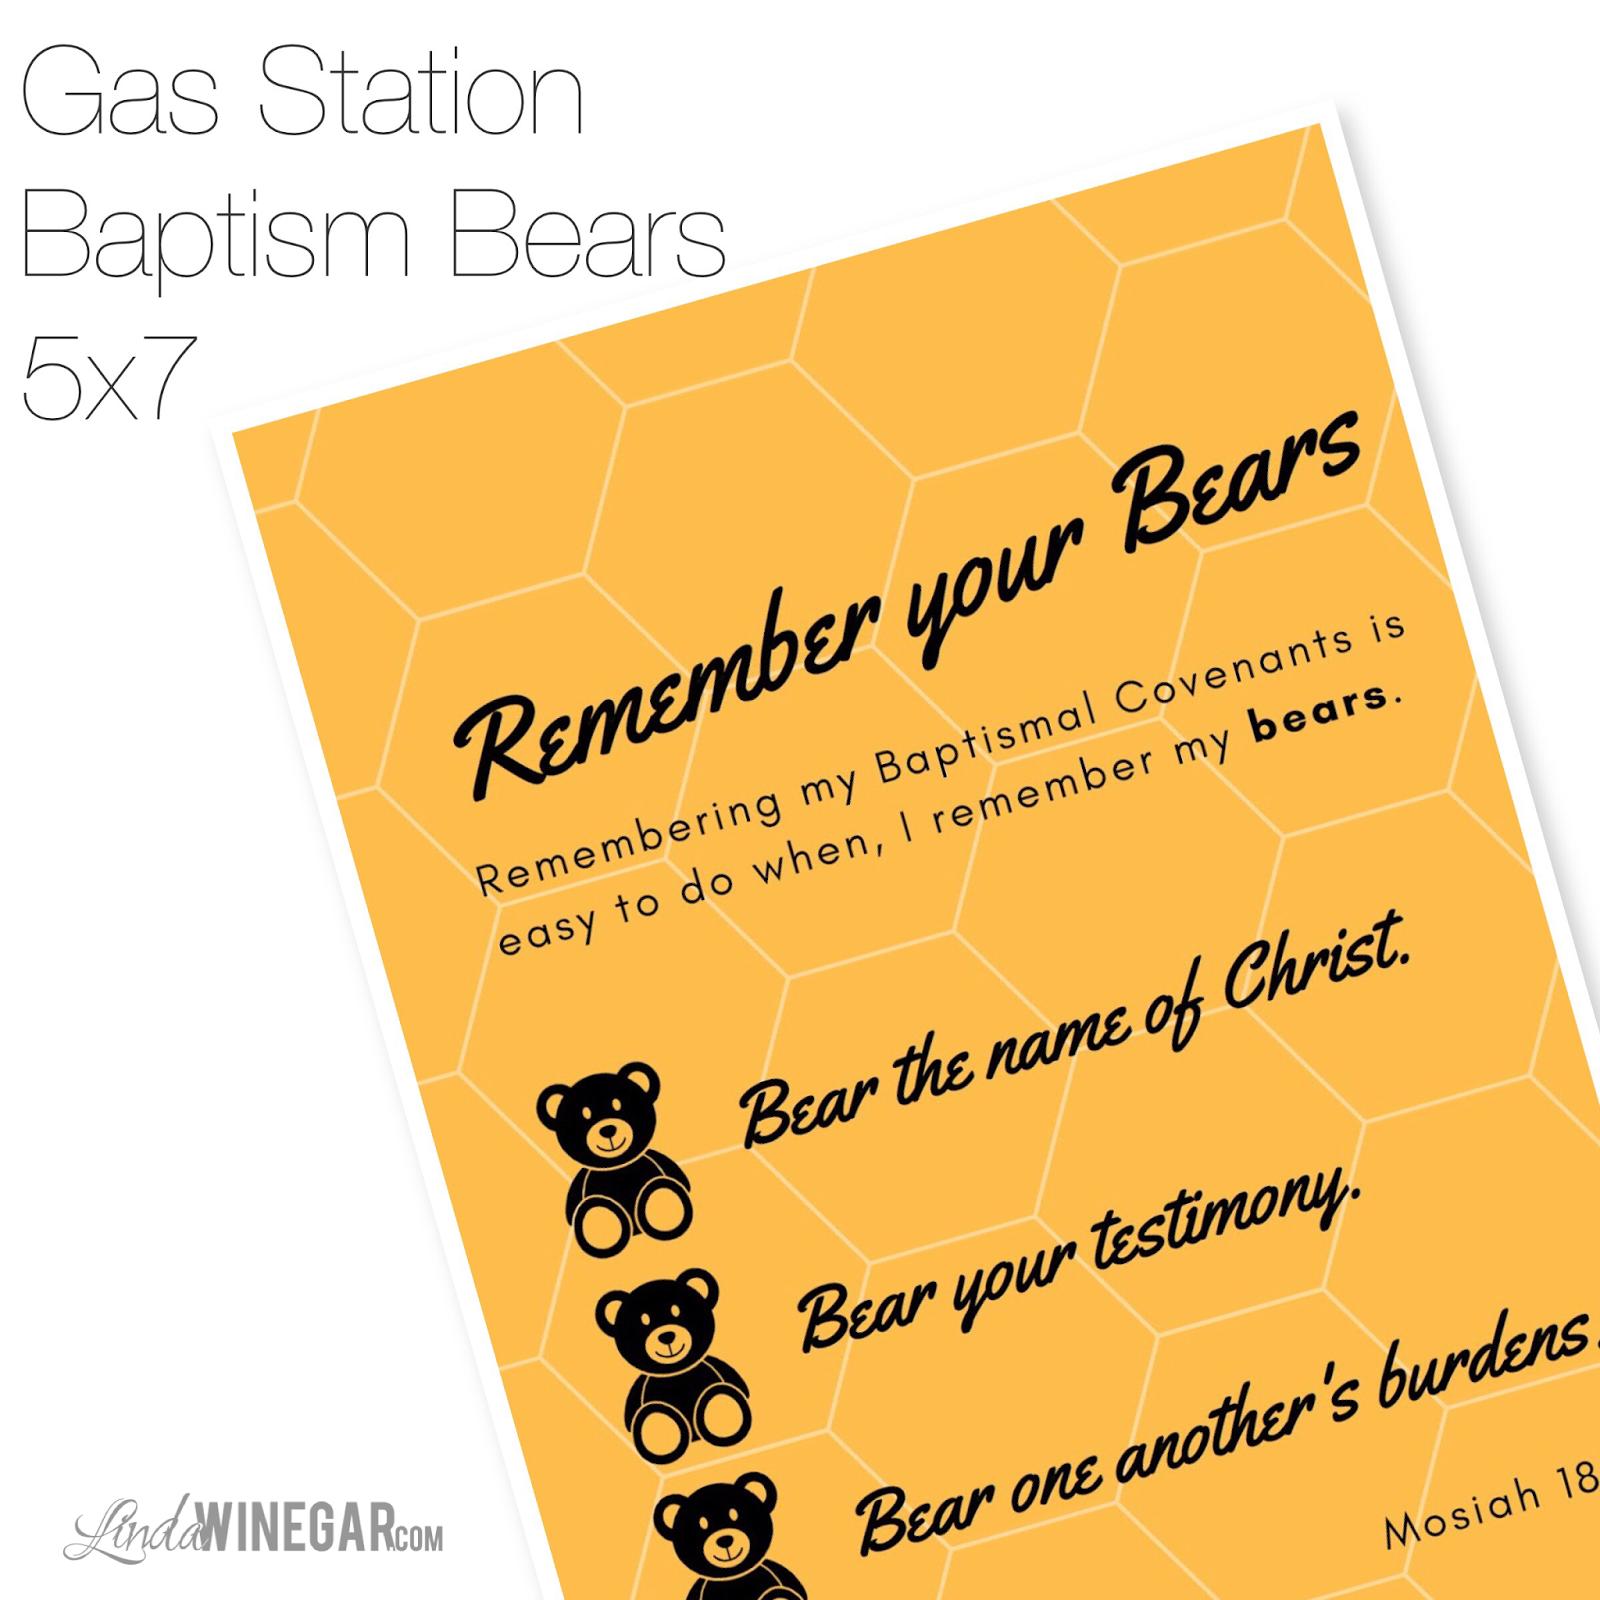 small resolution of baptism bears 4x6 lindawinegar png